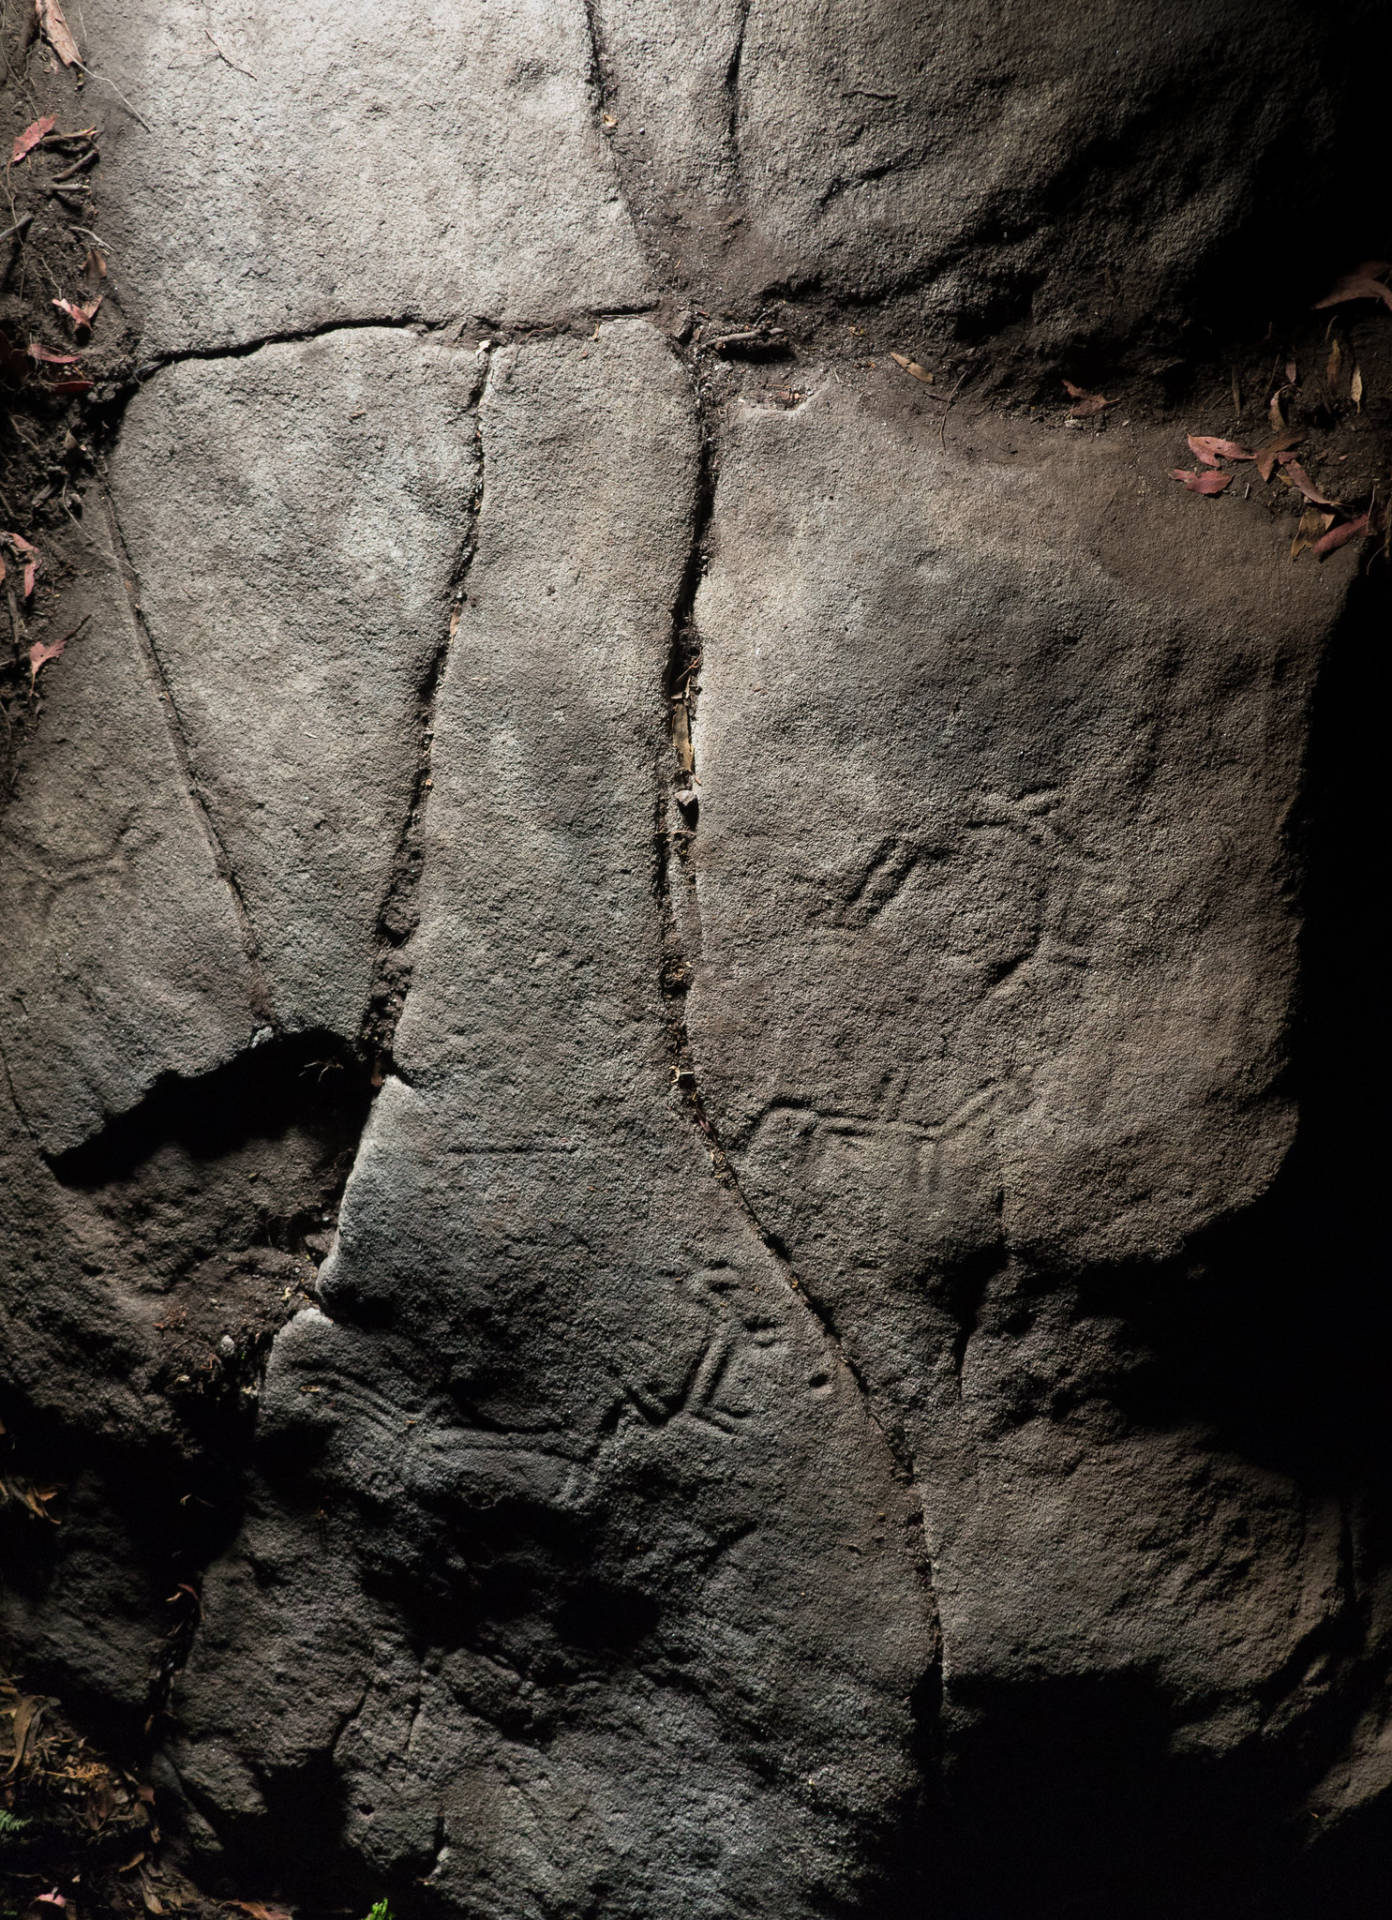 Vista Xeral da Pedra da Loba.©Colectivo a Rula.